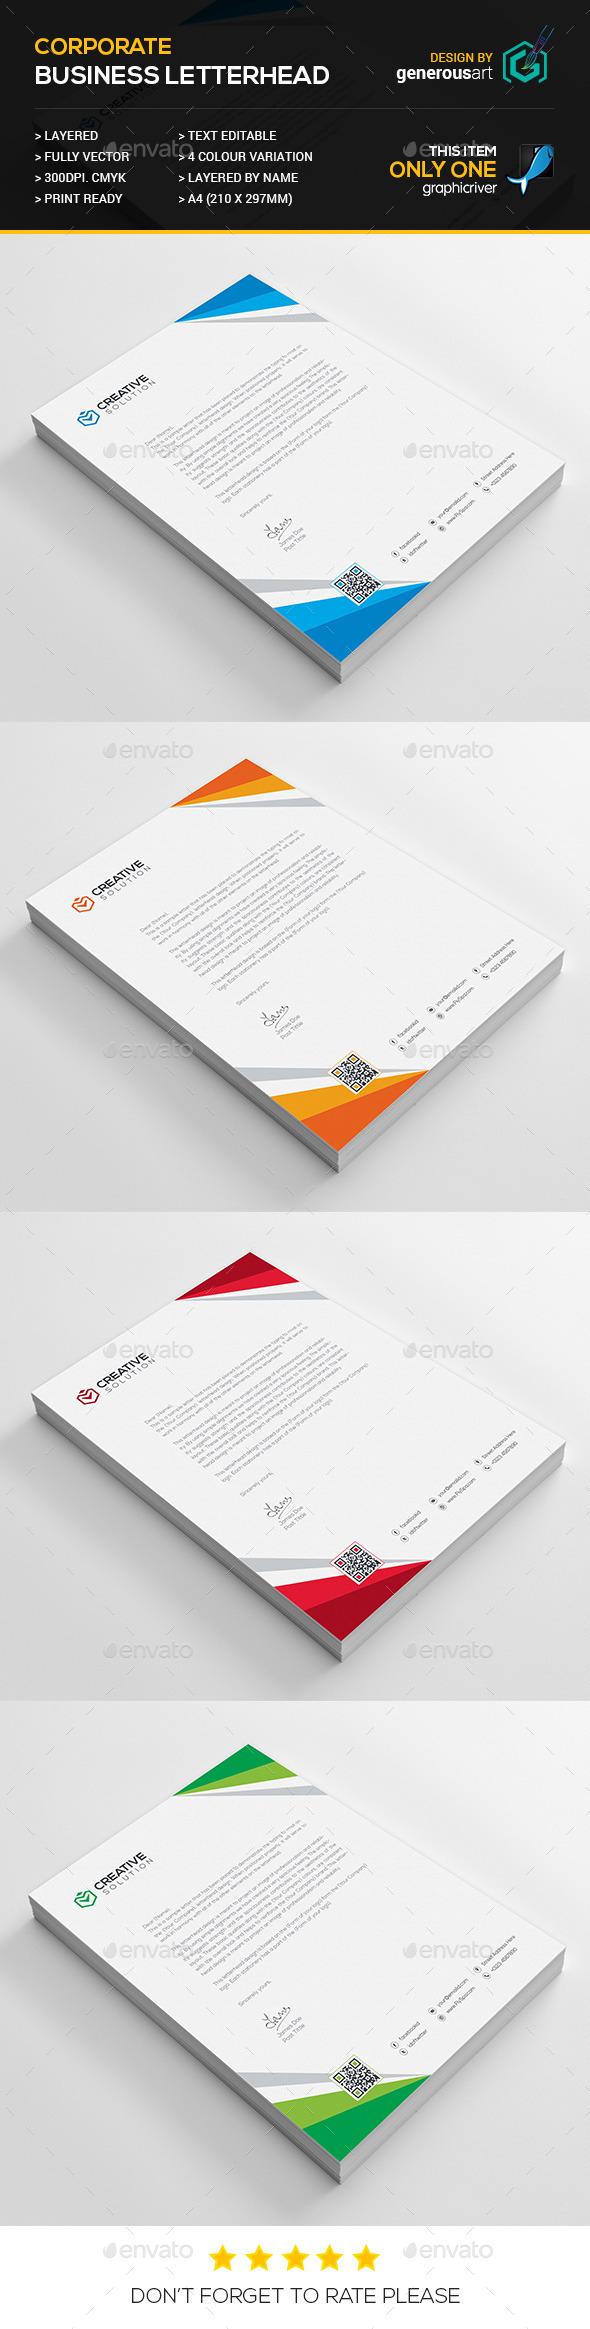 Business Letterhead 16